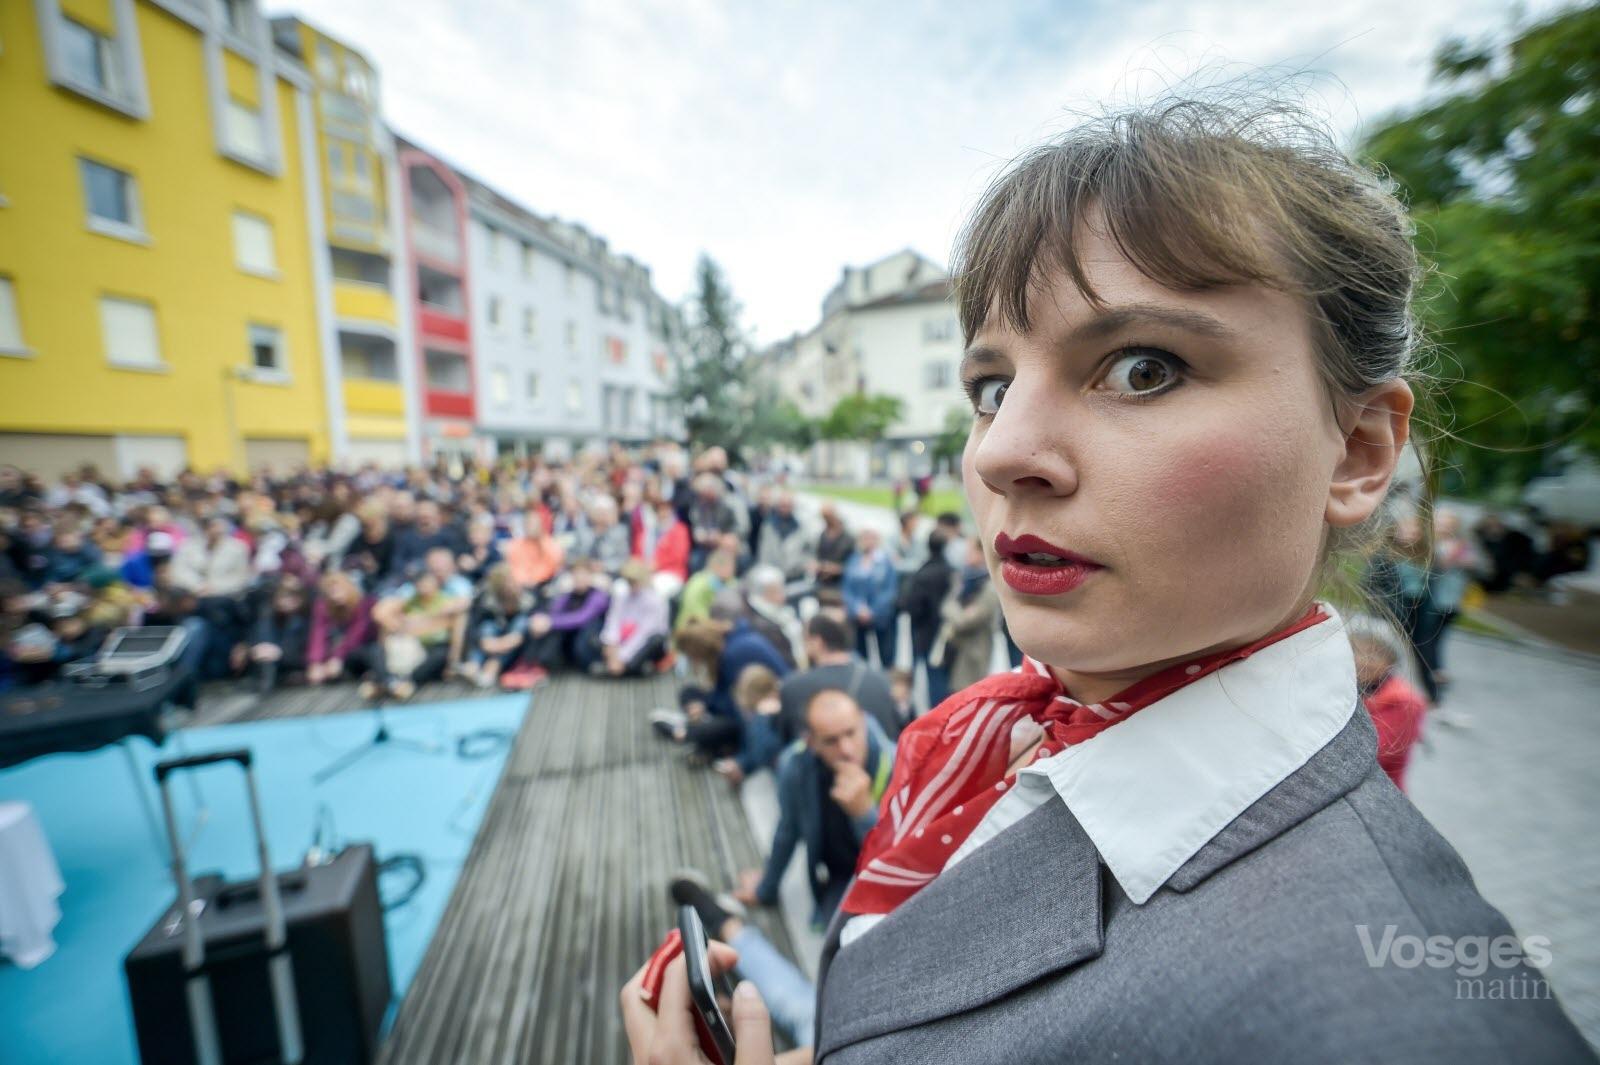 8festival-rues-et-cies-t-i-t-r-(thinkin-in-the-rain)-de-fanny-duret-vosges-matin-jerome-humbrecht-1560541958.jpg